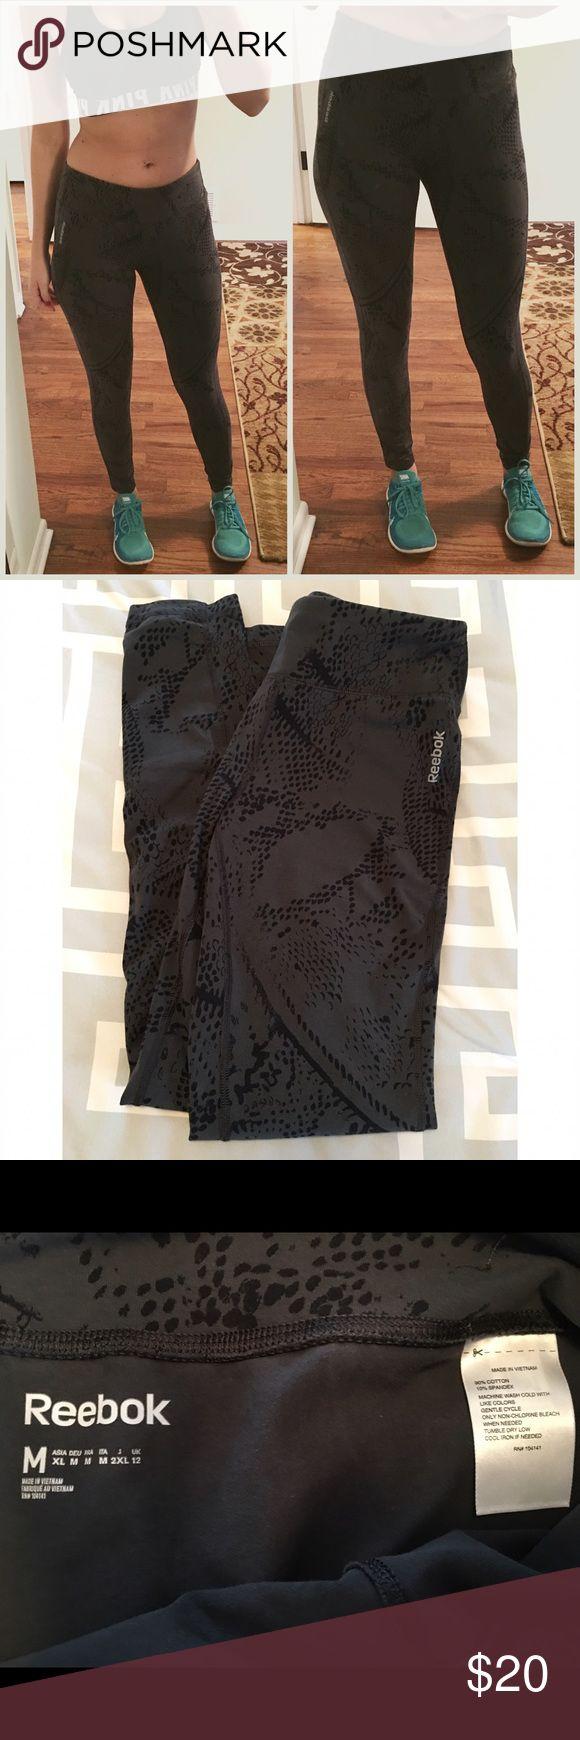 • reebok yoga pants • NWOT reebok gray yoga pants. Size medium 90% cotton 10% spandex.  ❌No trades 🚫🚬 Non smoking home 📬 Same/next day shipping Reebok Pants